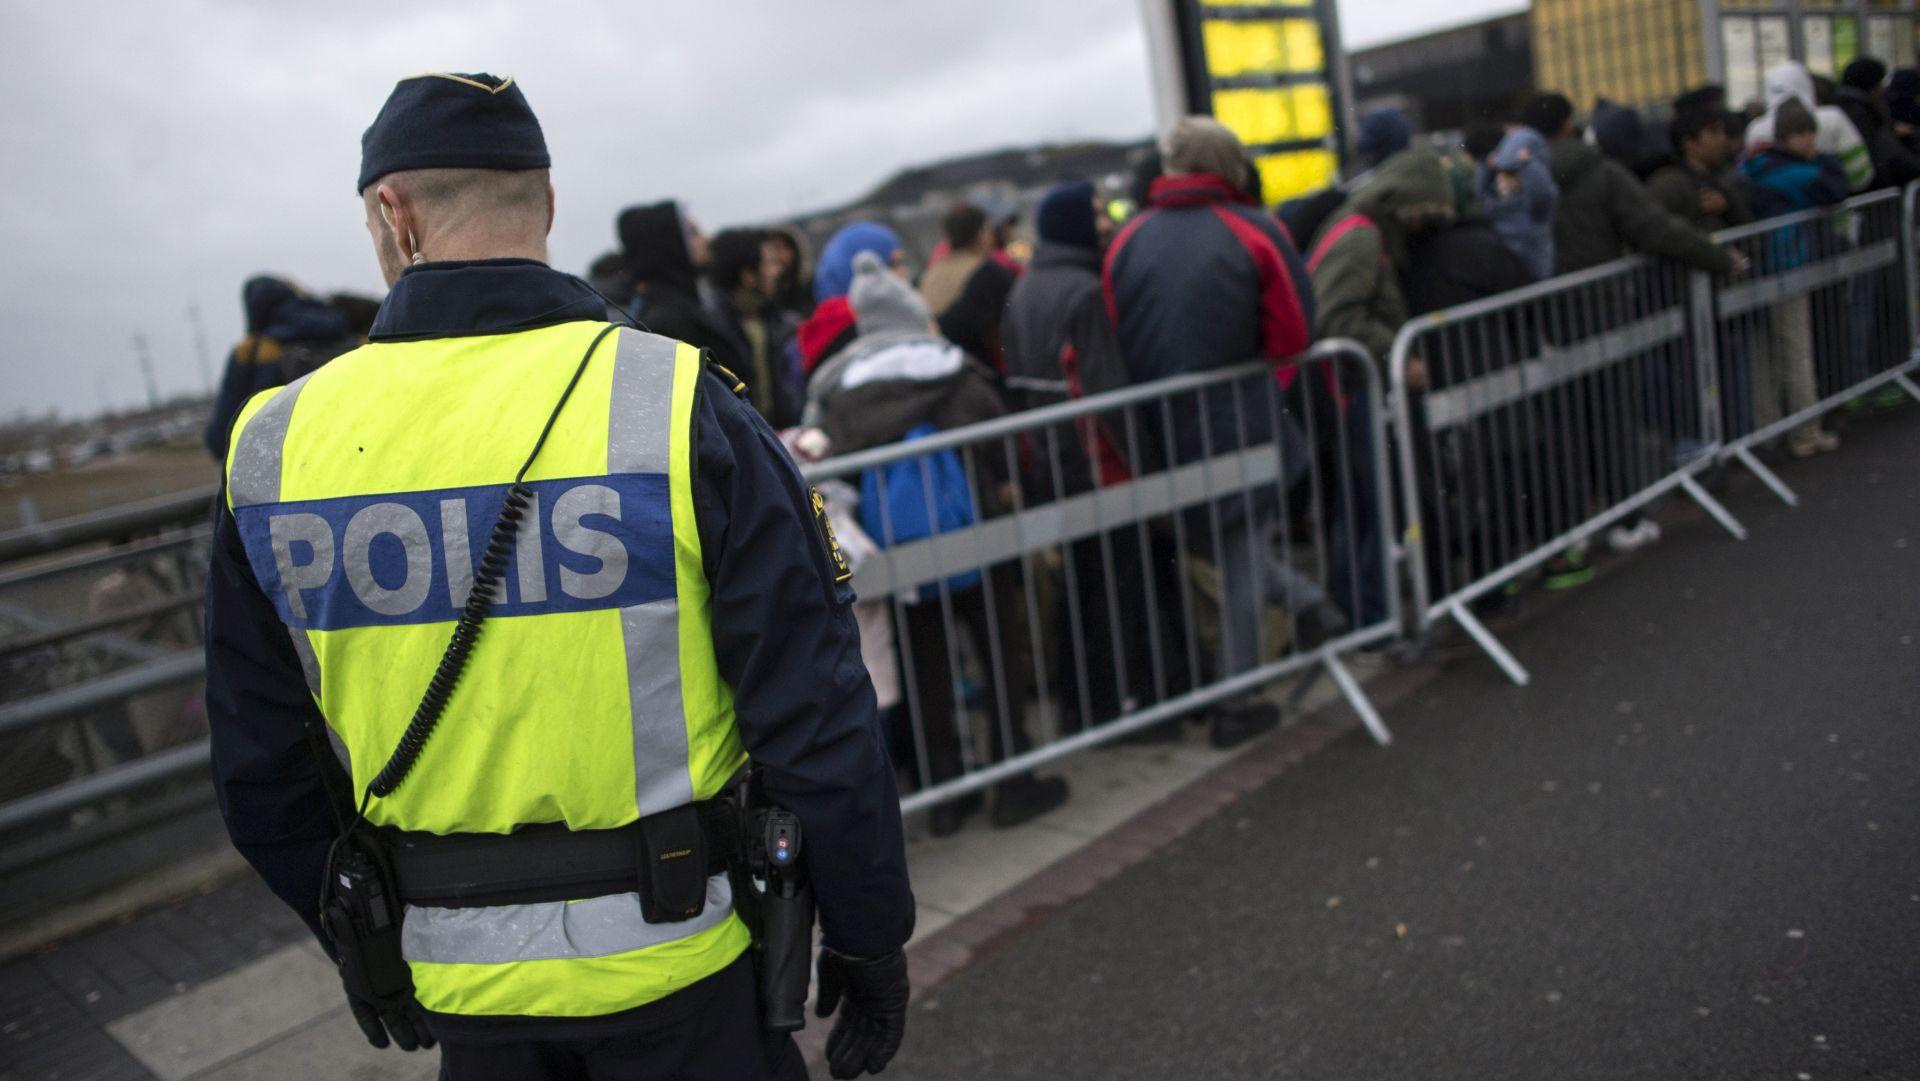 ZA SMANJENJE NAPETOSTI: Švedska potiče privremeni rad migranata